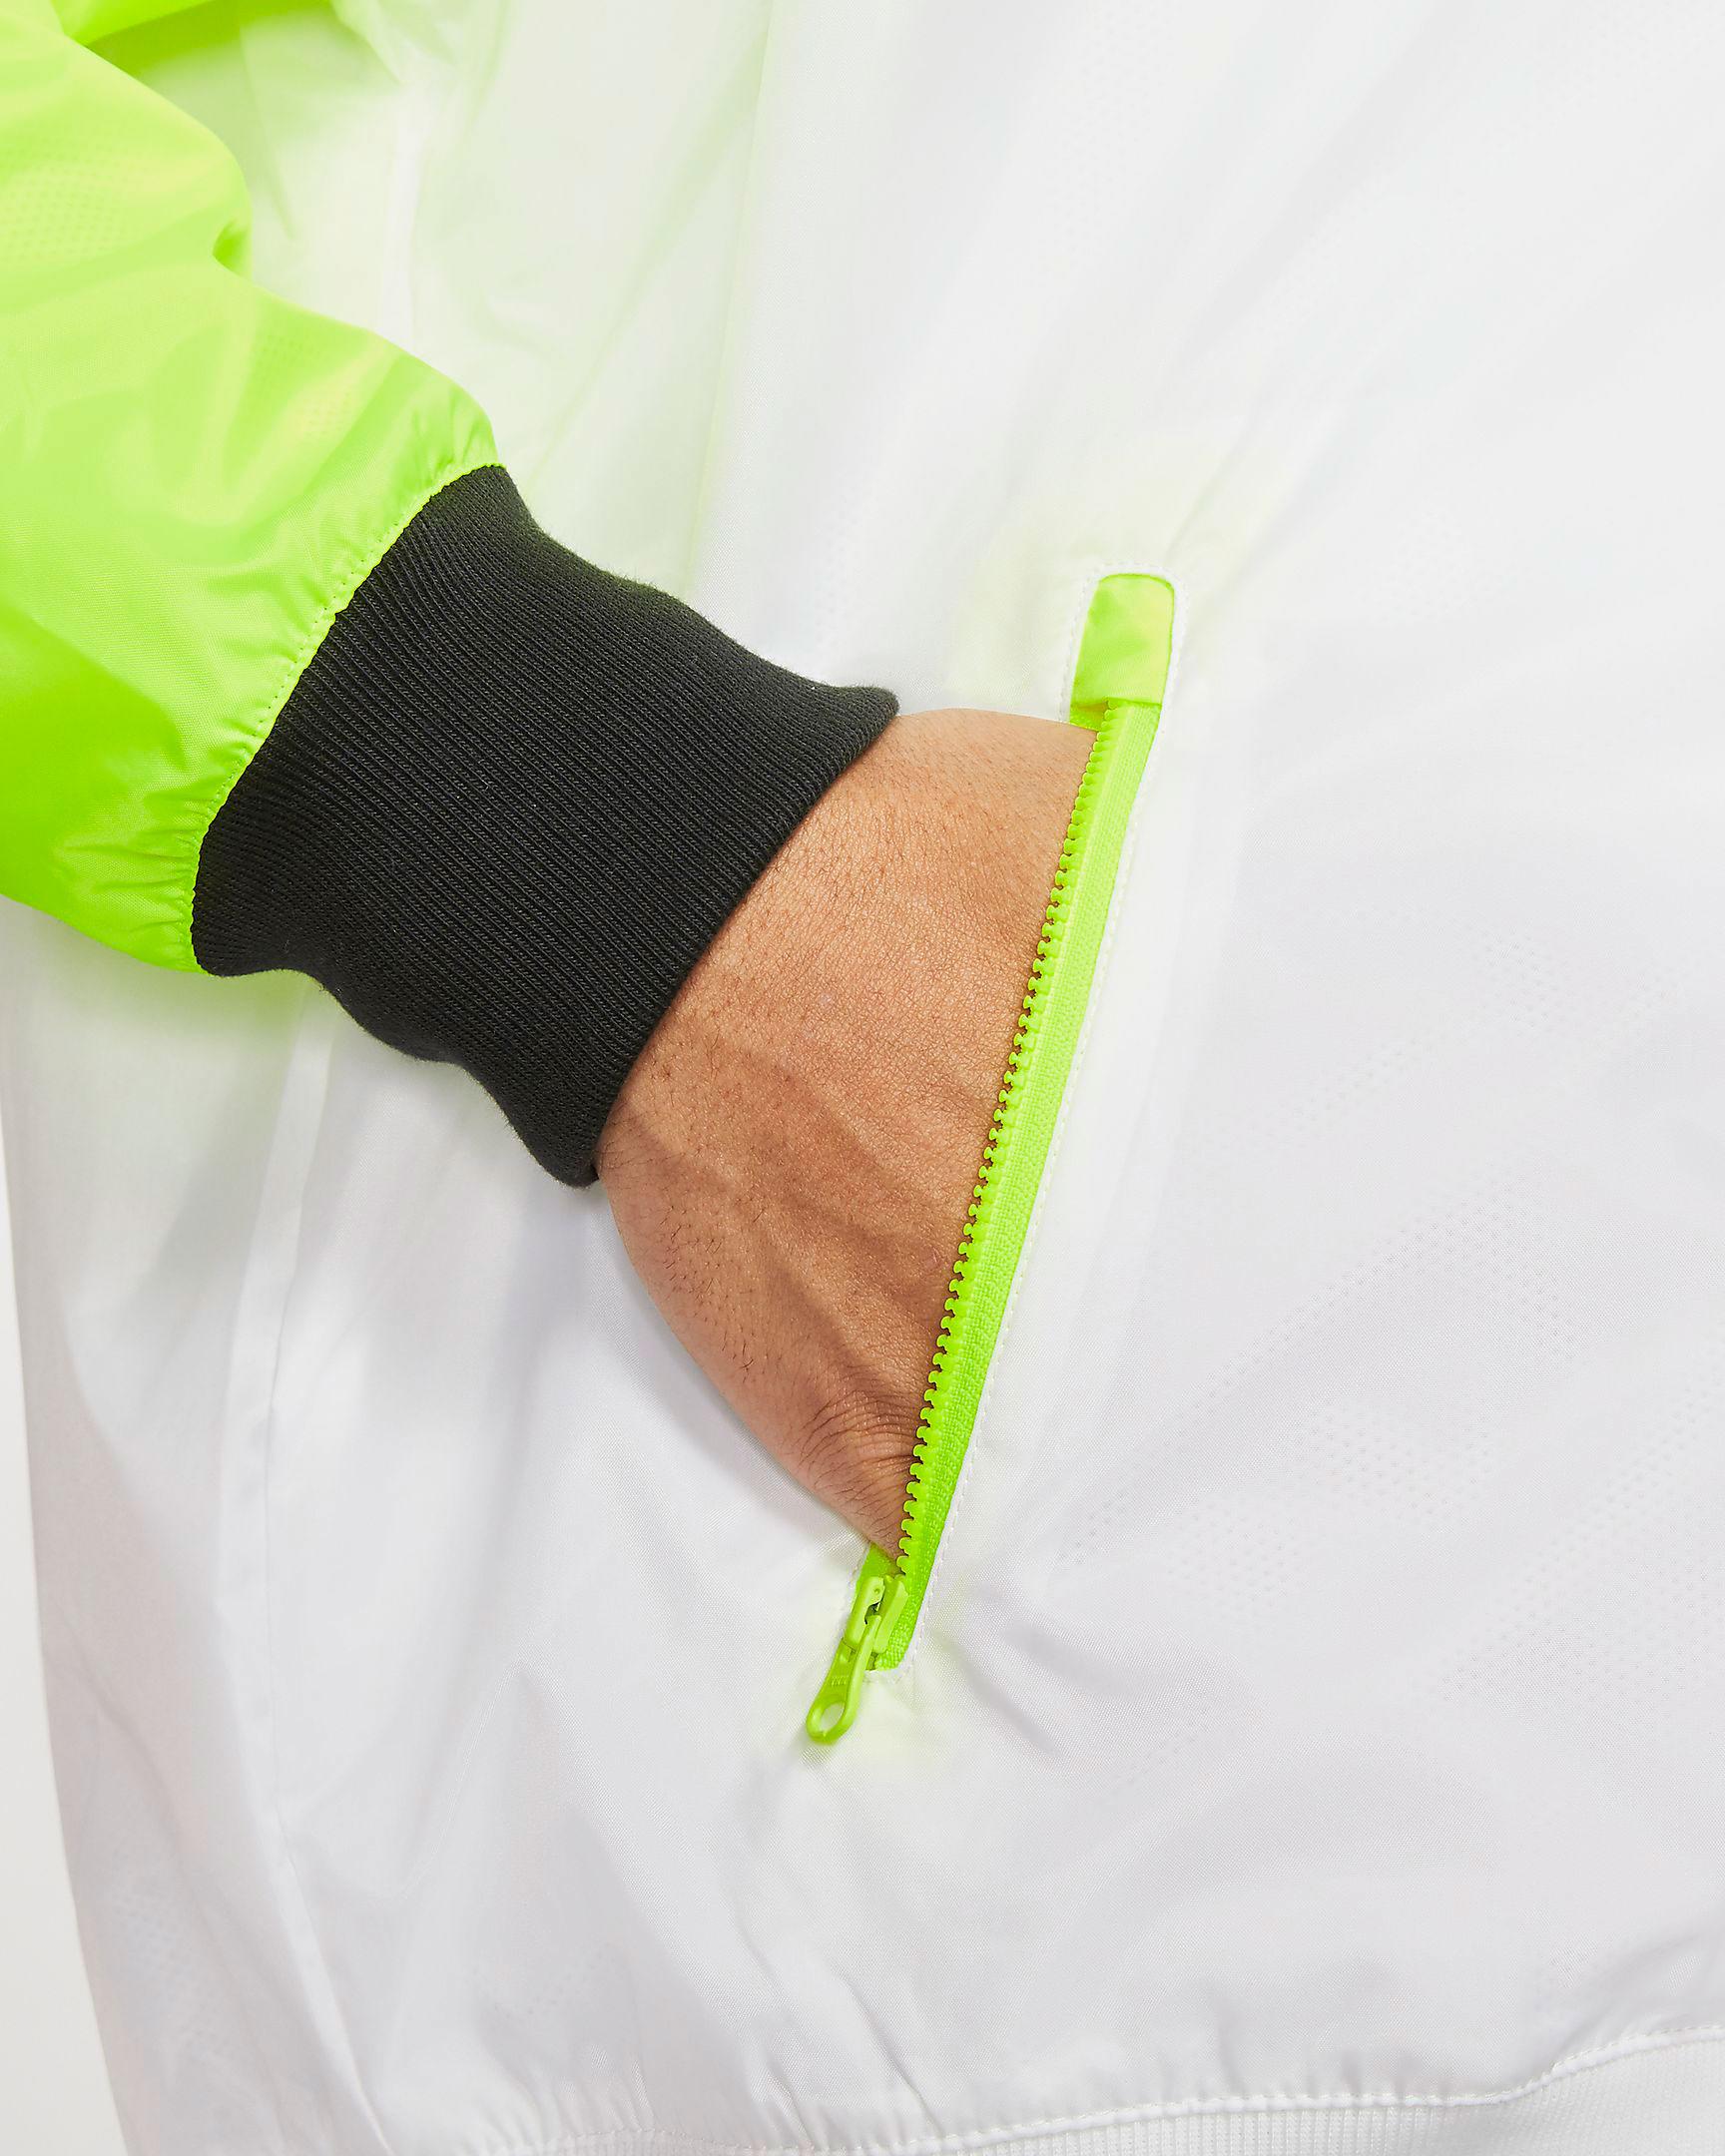 air-jordan-4-neon-volt-nike-jacket-match-4